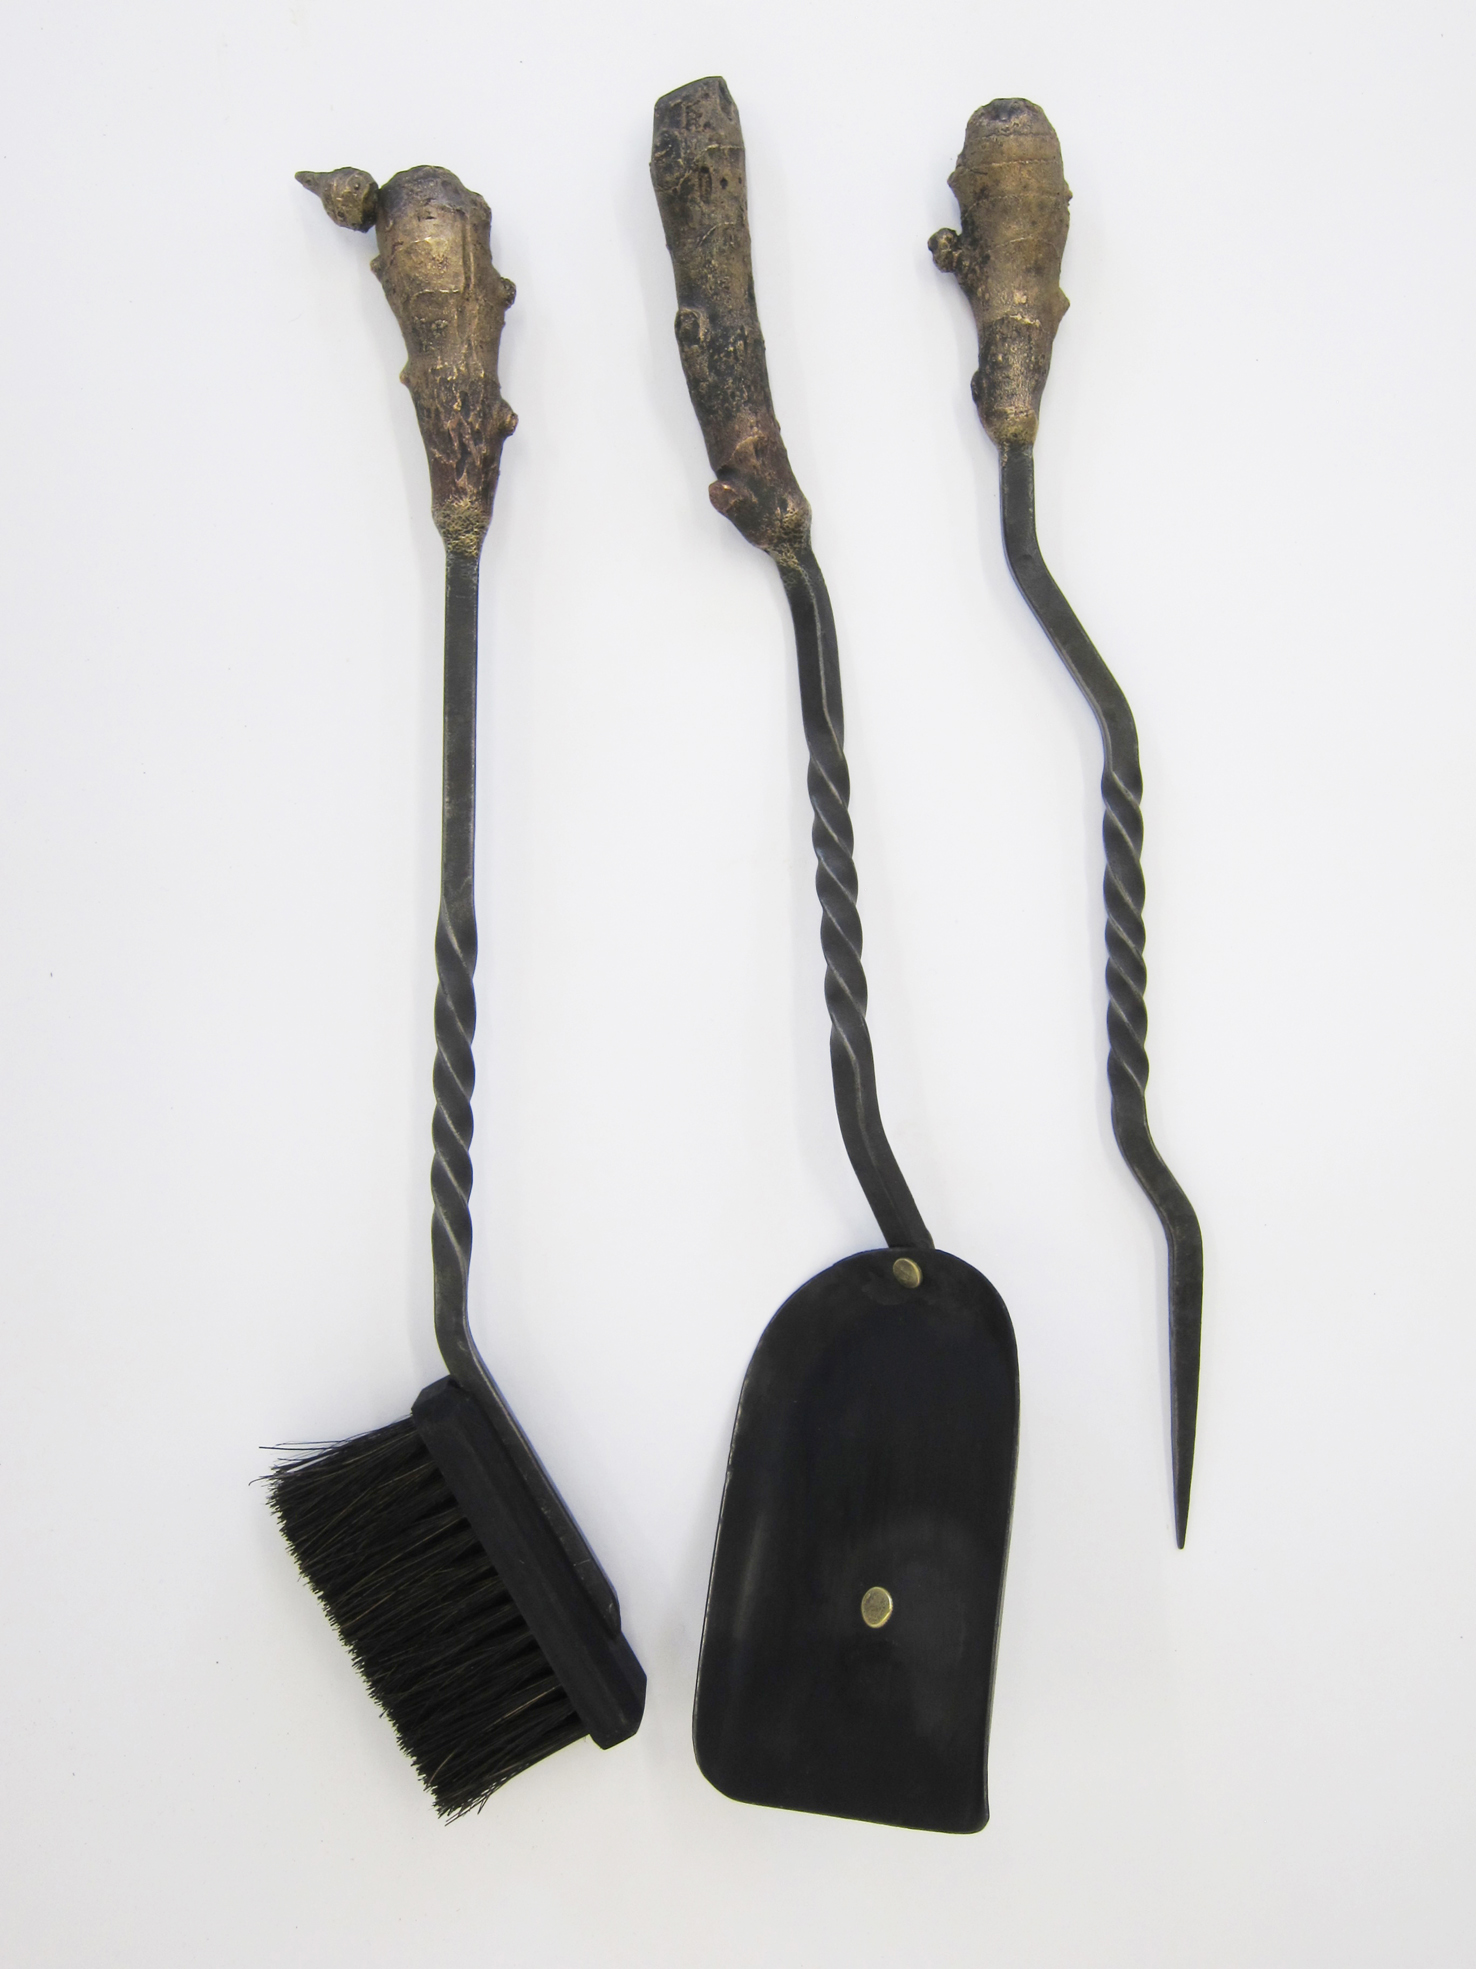 Ginger Threesome, wrought iron, cast bronze, shovel 11 x 21 x 52cm /poker 8 x 4 x 45 cm /brush  25 x 4 x 51 cm